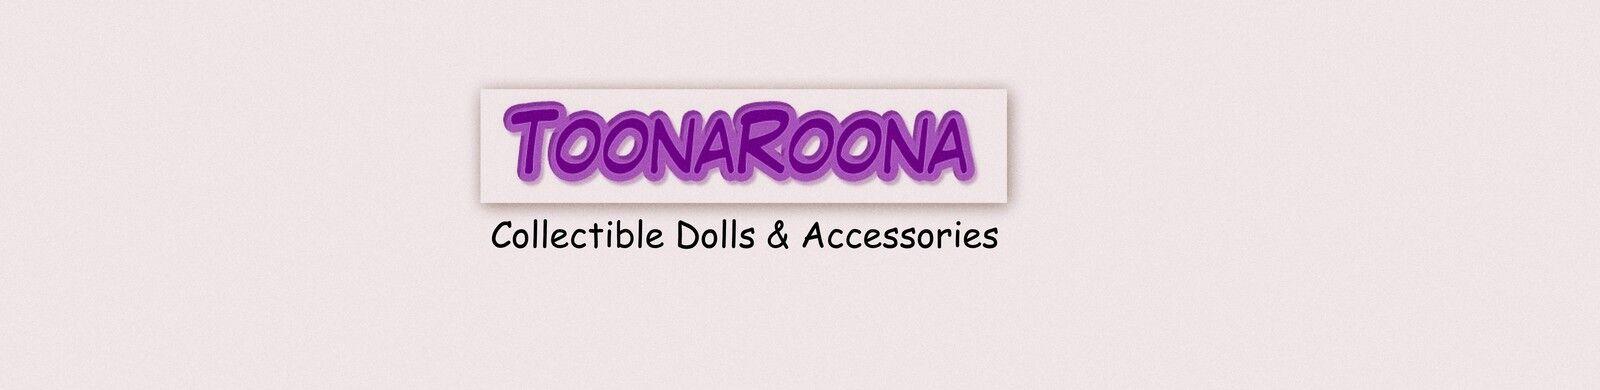 ToonaRoona